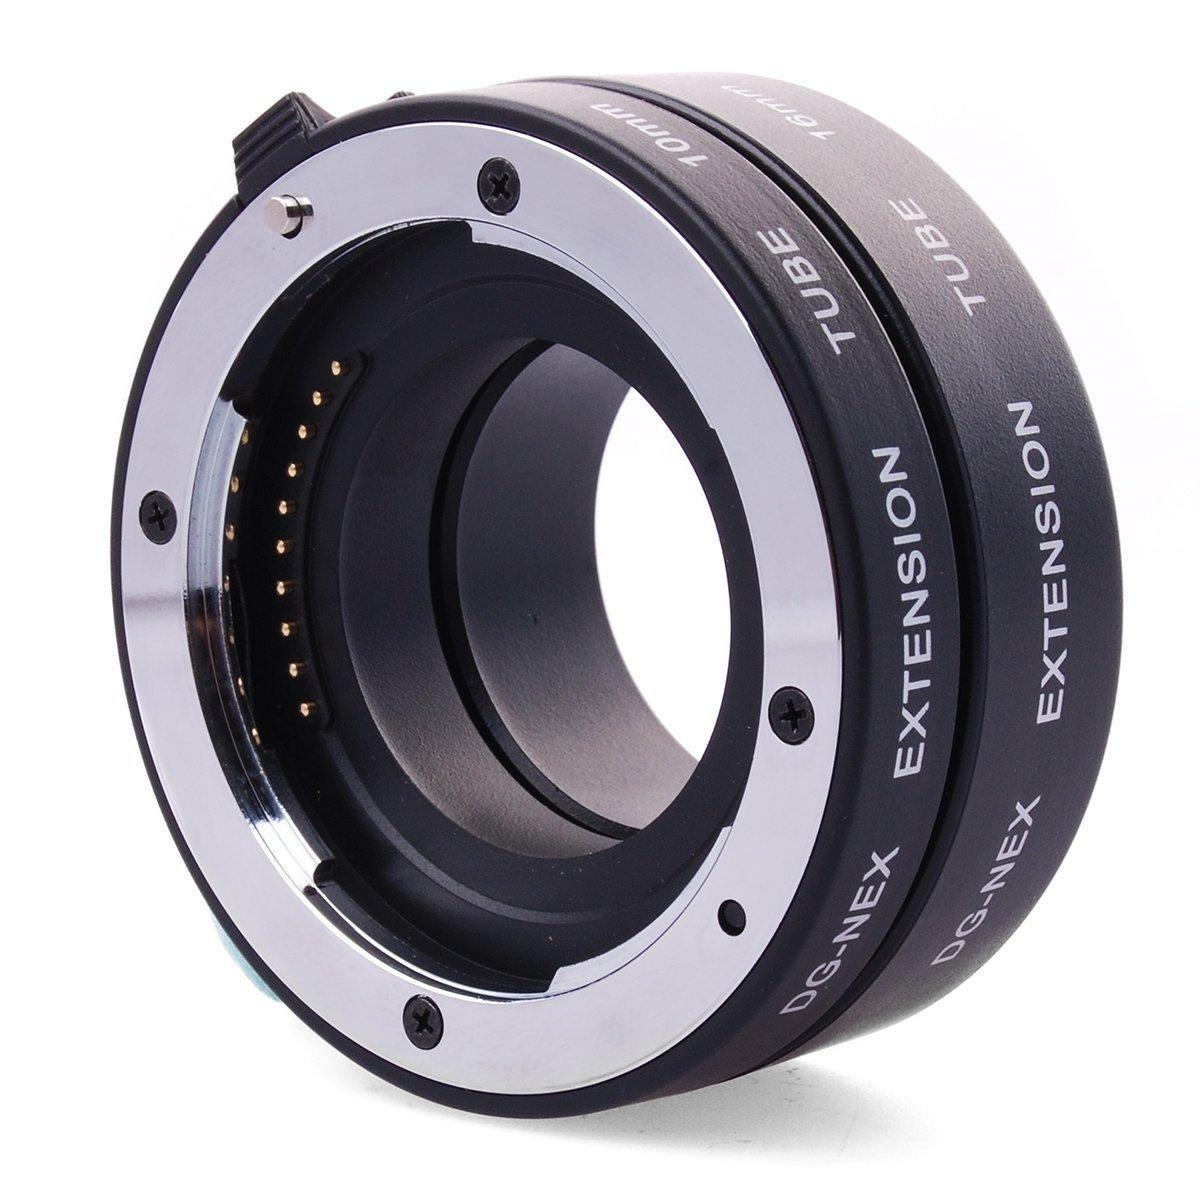 DG-NEX metal AF de enfoque automático macro e autofocus tubo de extensión de metal para Sony e-mount NEX-7 NEX-6 NEX-5R NEX-5T NEX-3N NEX-F3